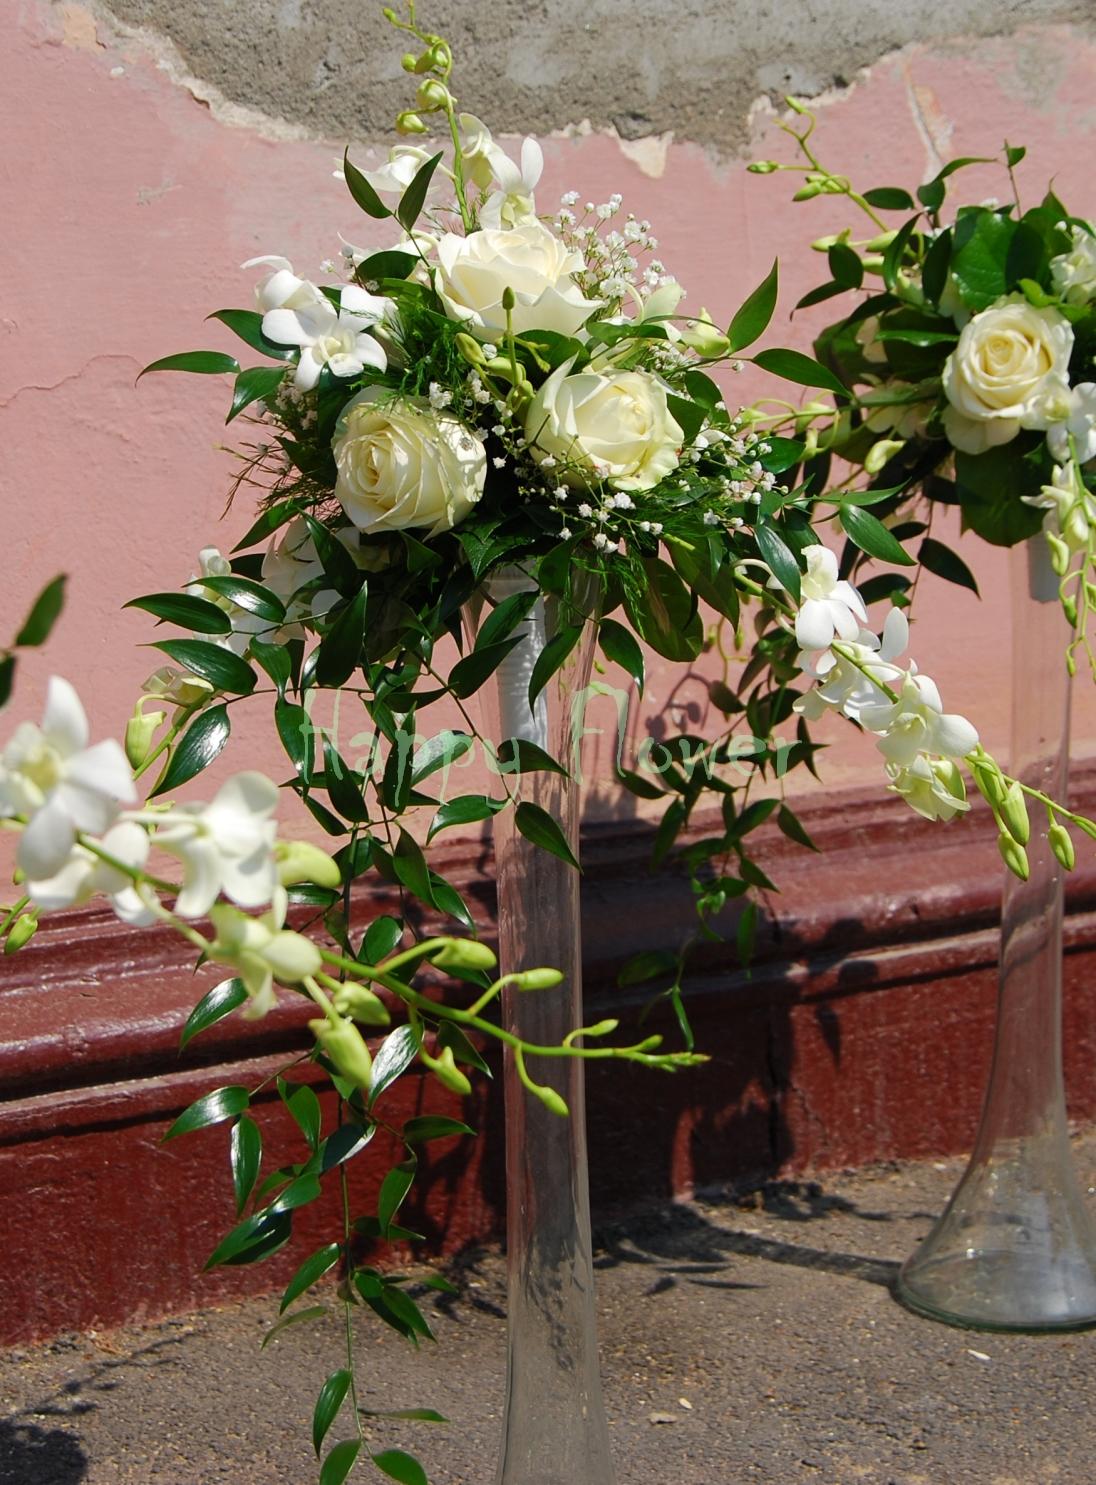 Aranjament nunta orhidee alba, trandafiri albi, floarea miresei